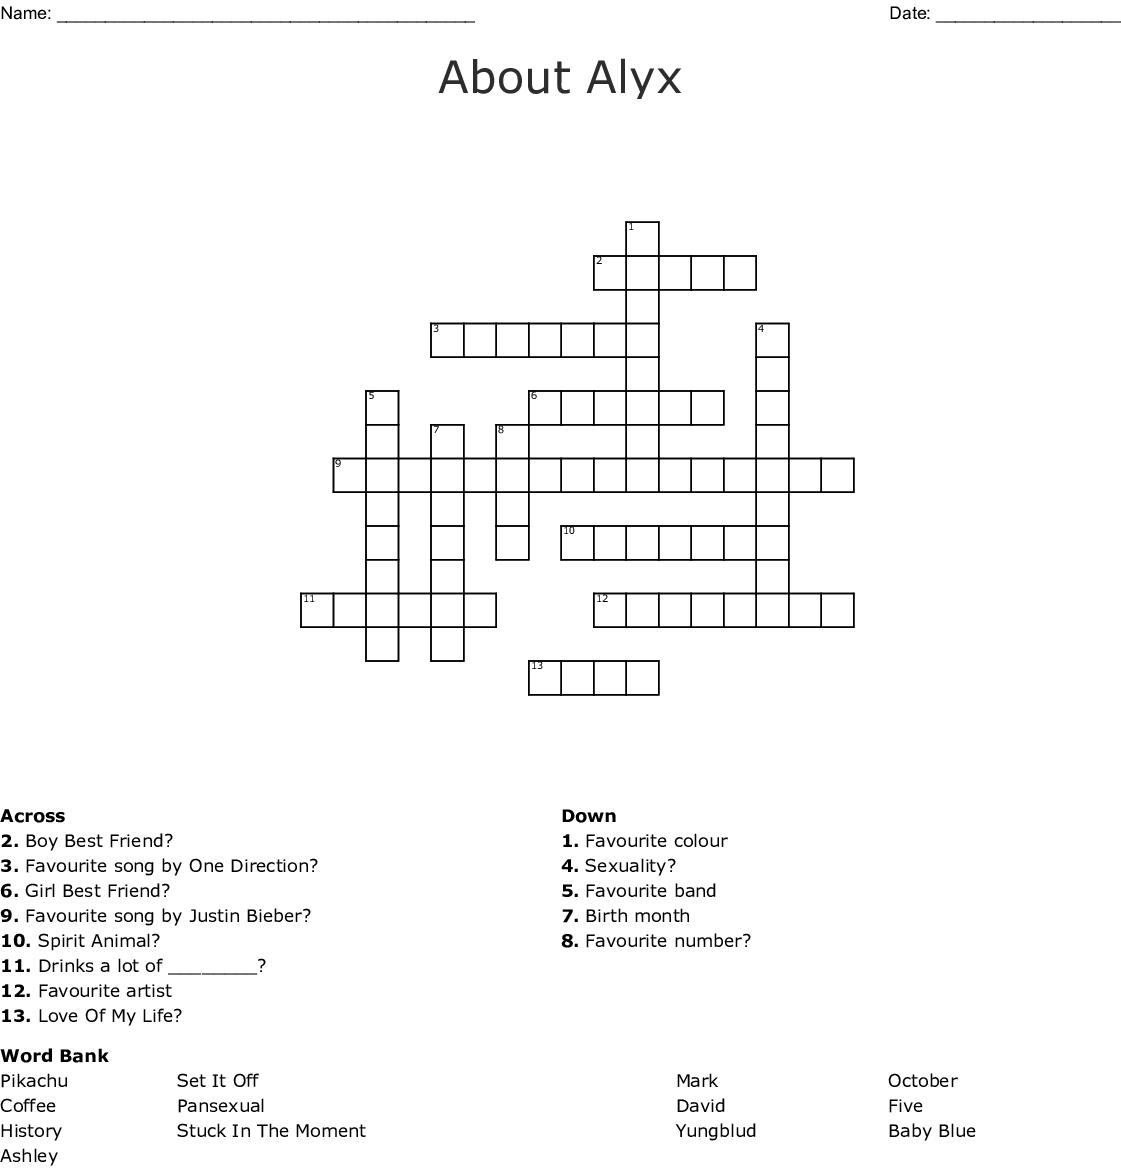 About Alyx Crossword